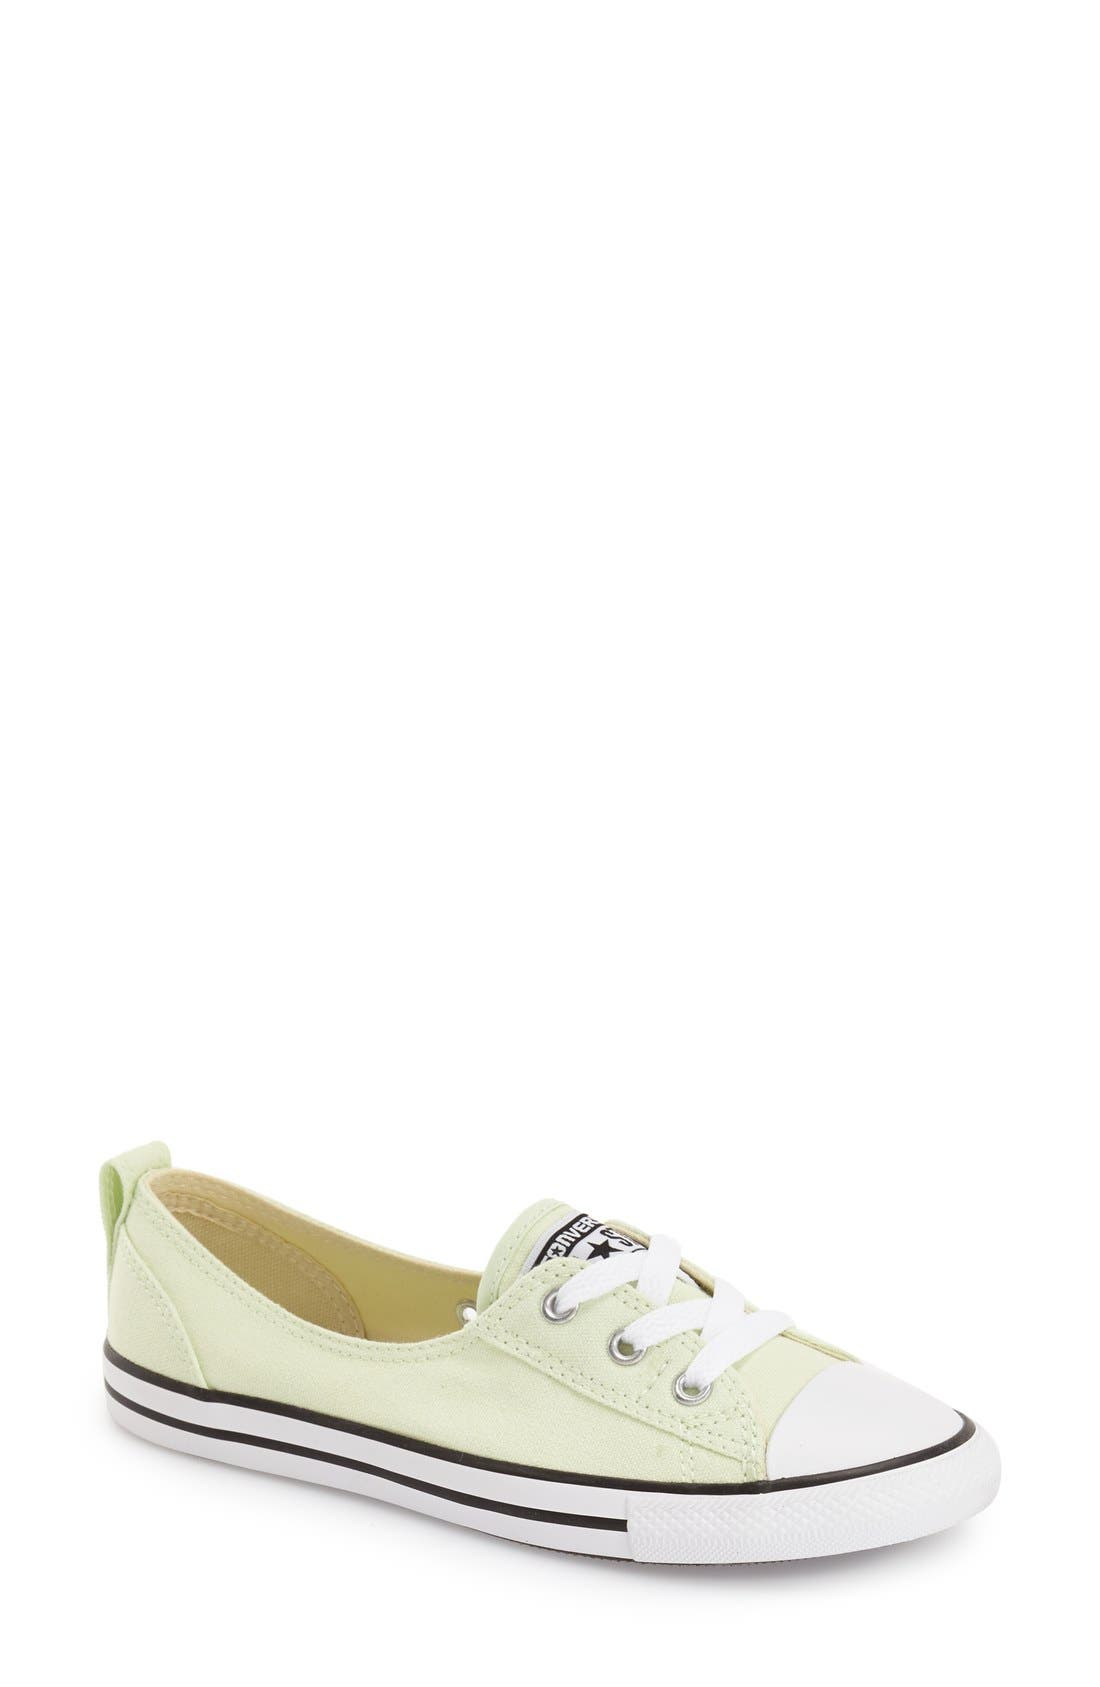 Main Image - Converse Chuck Taylor® All Star® Ballet Sneaker (Women)